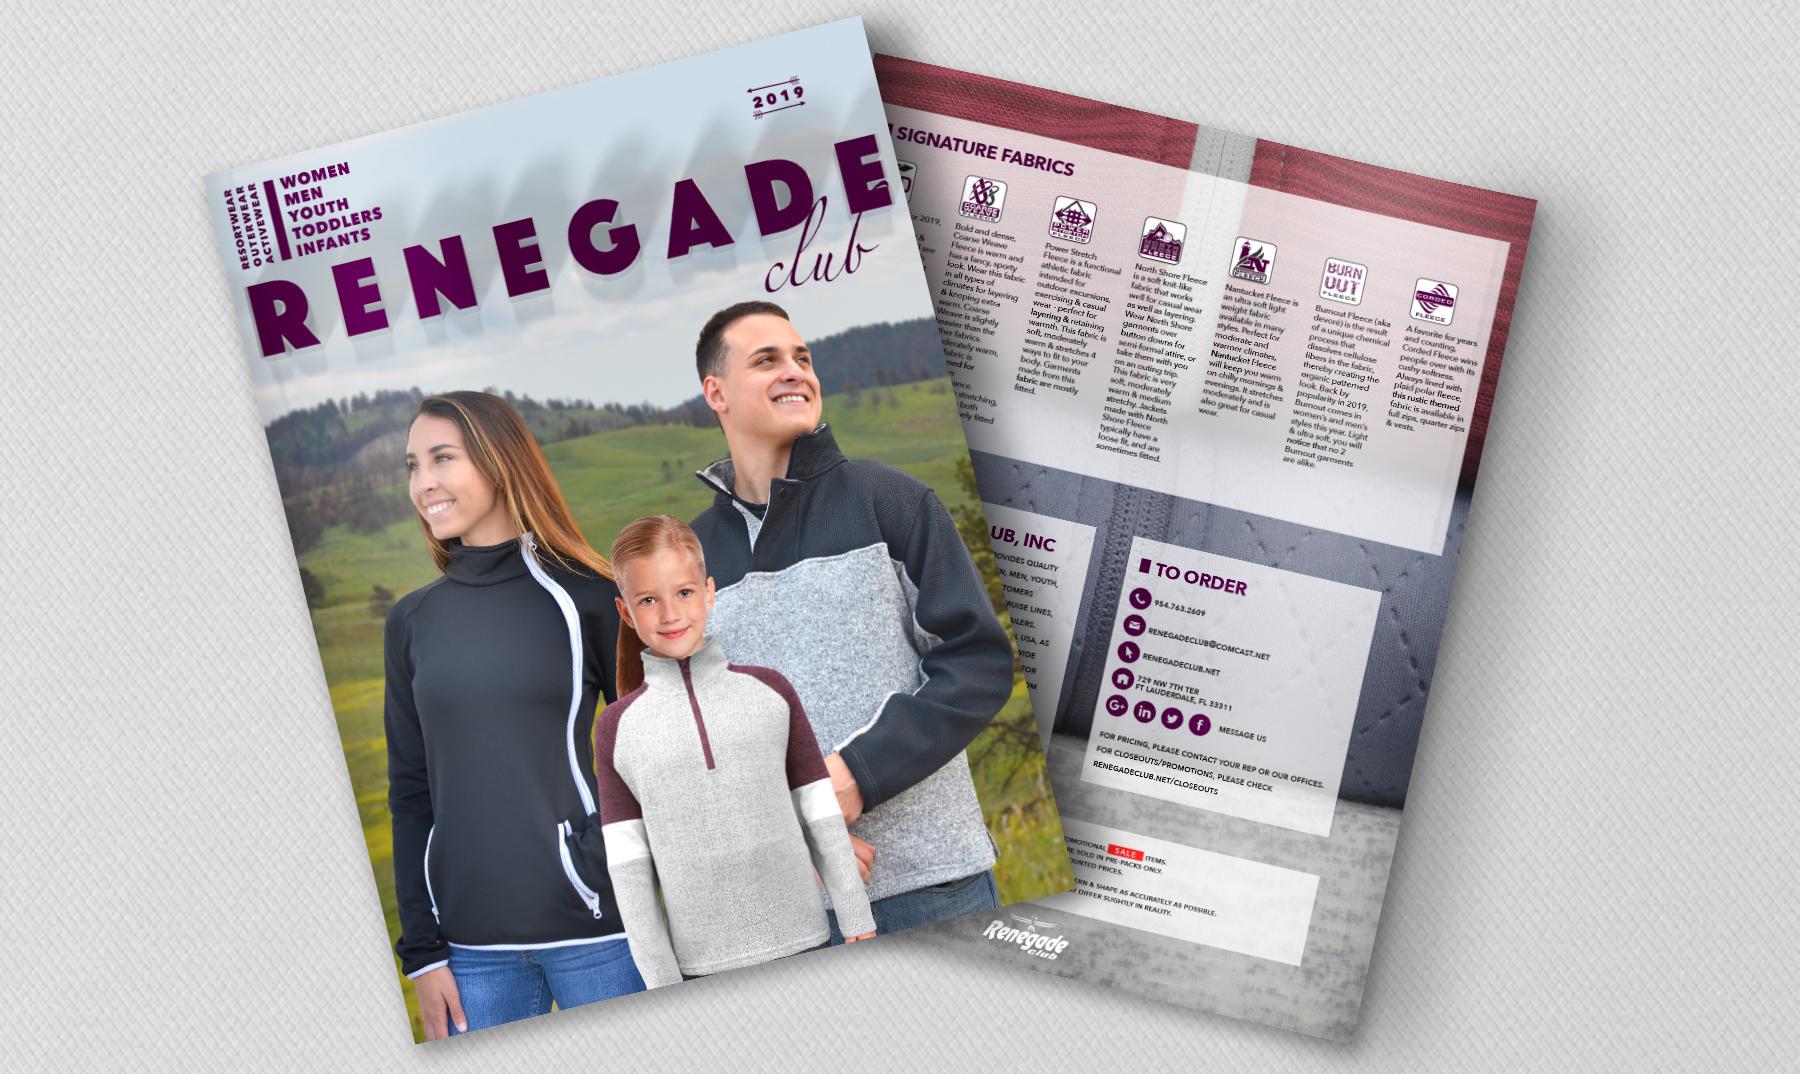 renegade club clothing wholesale catalog, 2019, men, women, kids, black jacket, gray jacket, fleece jacekts